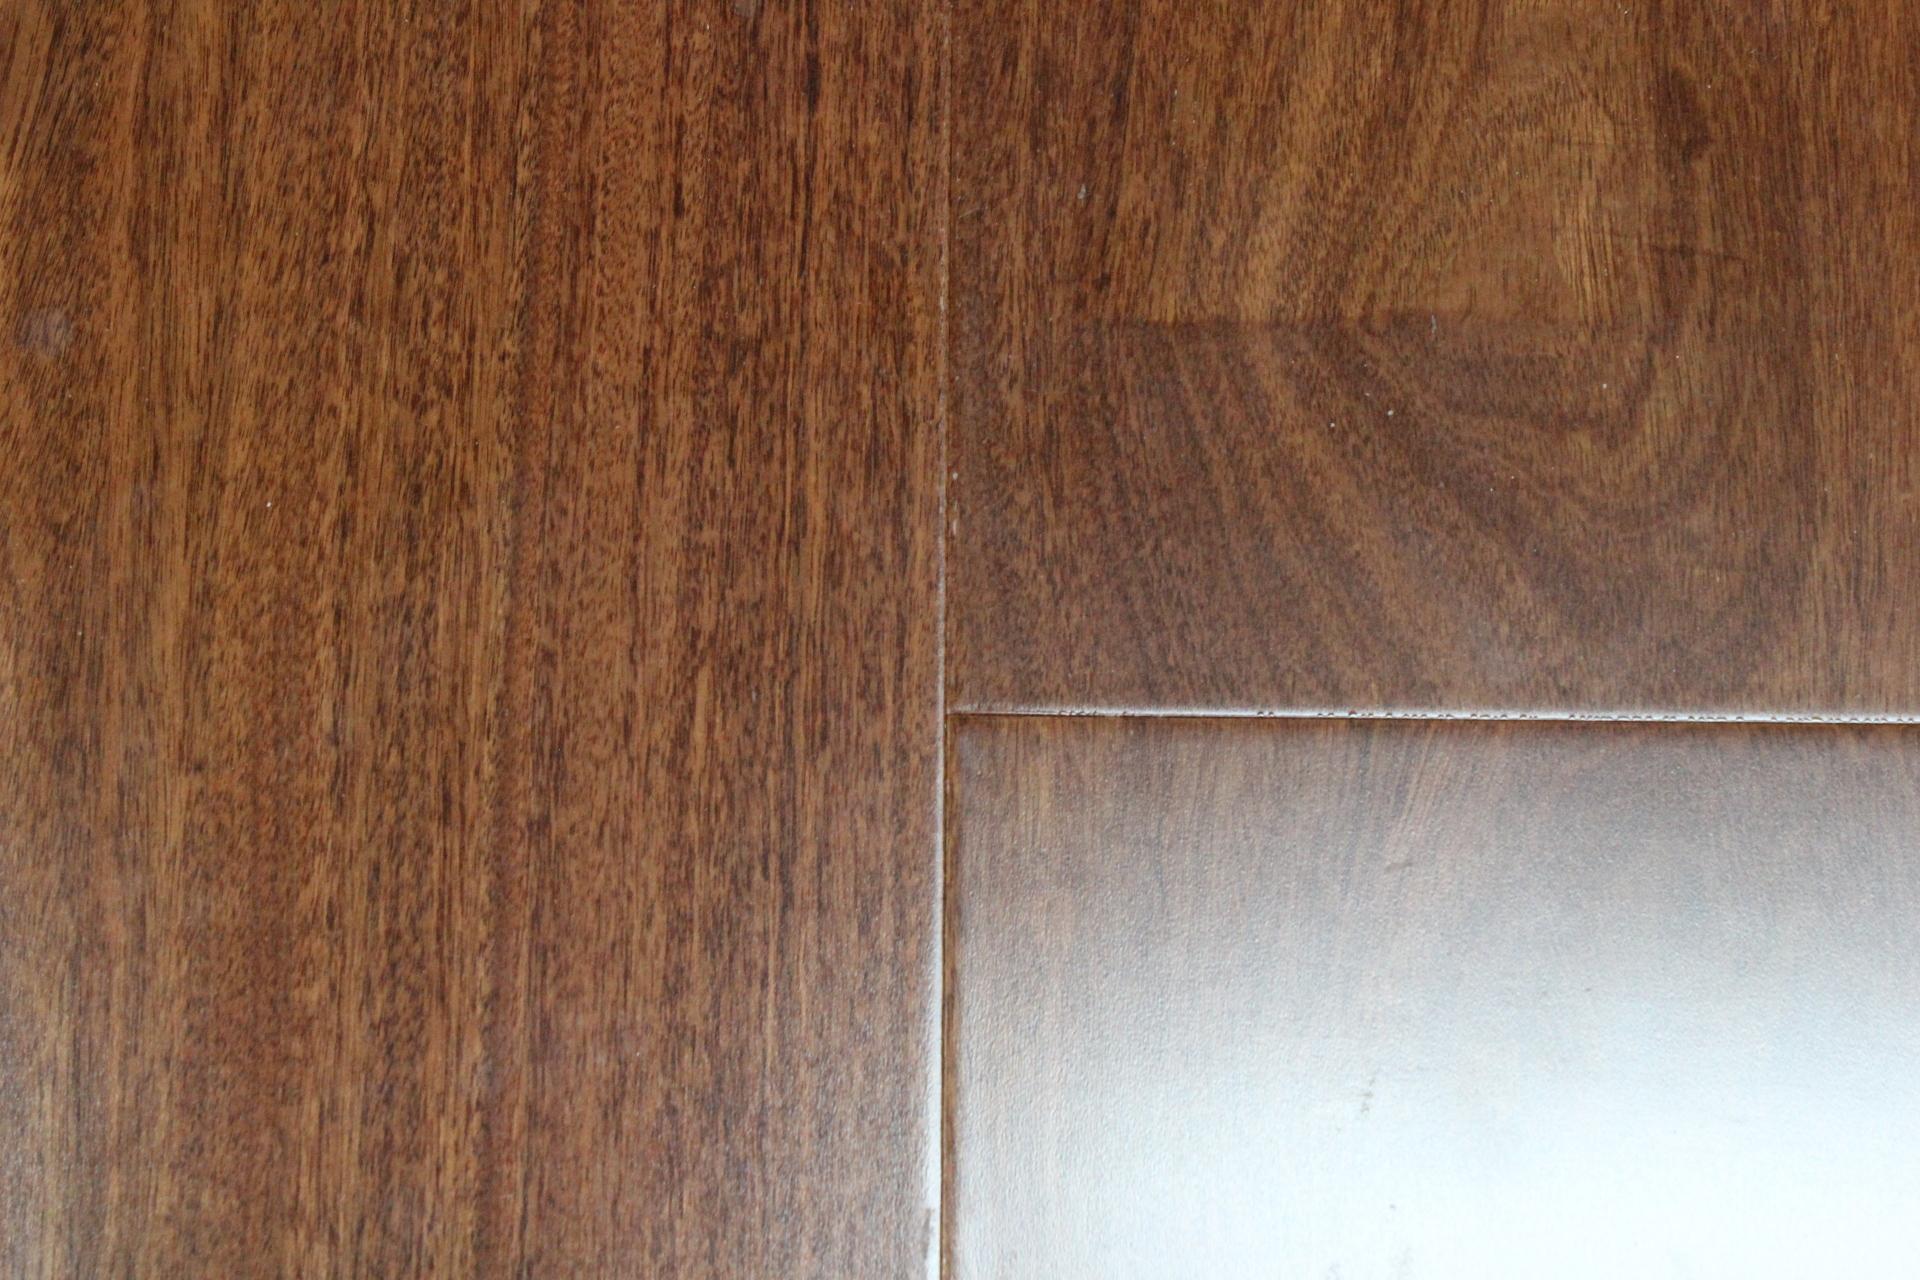 Hardwood, prefinished floor, engineered wood, solid wood, lifestyle, hard surface, prefinished hardwood, prefinished wood, home, design, interior design, wood floor design, indus parquet, indusparquet